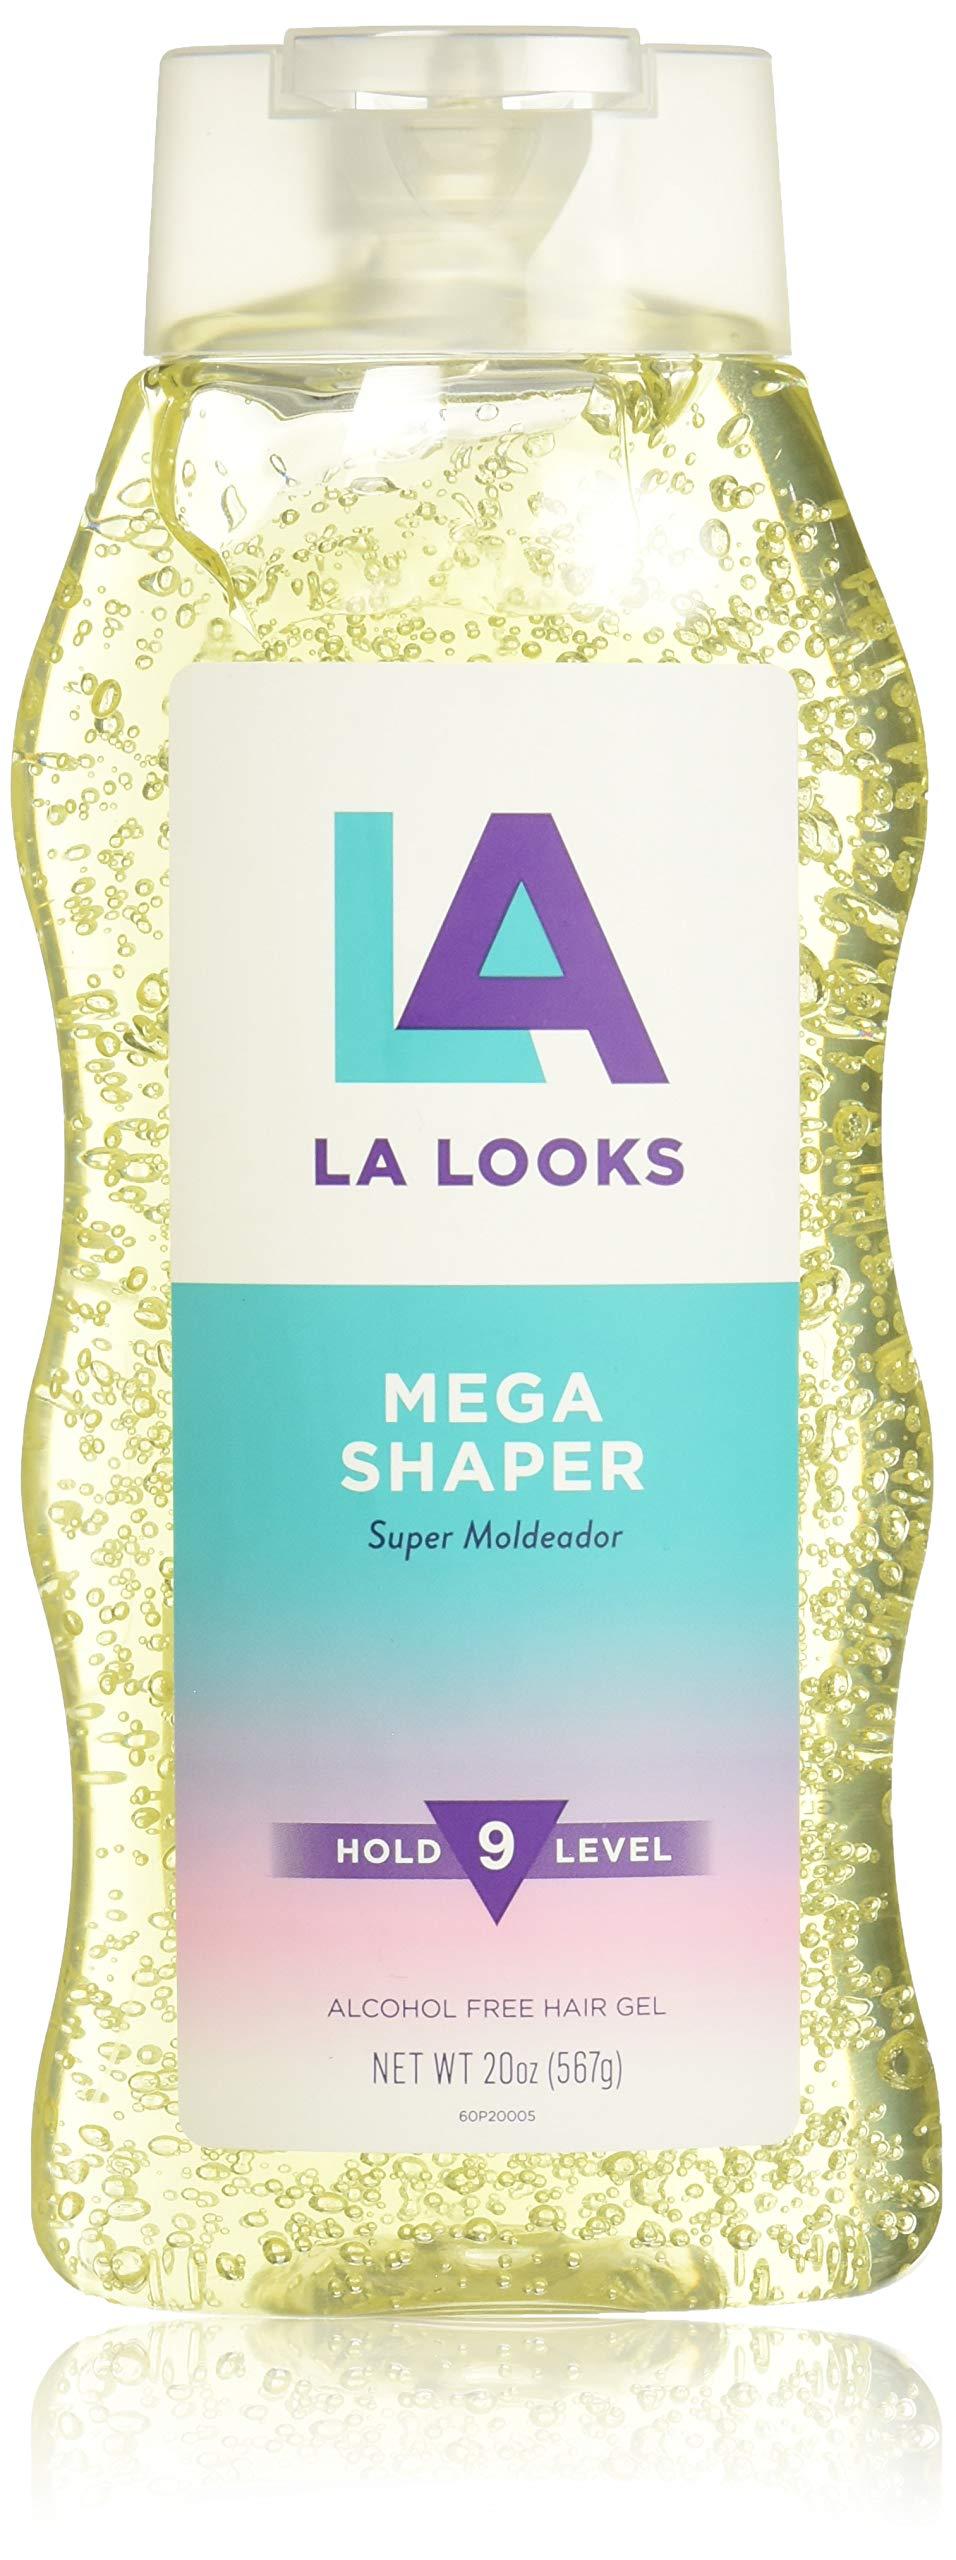 LA Looks Mega Shaper, #9 Hold Level, 20 Ounce